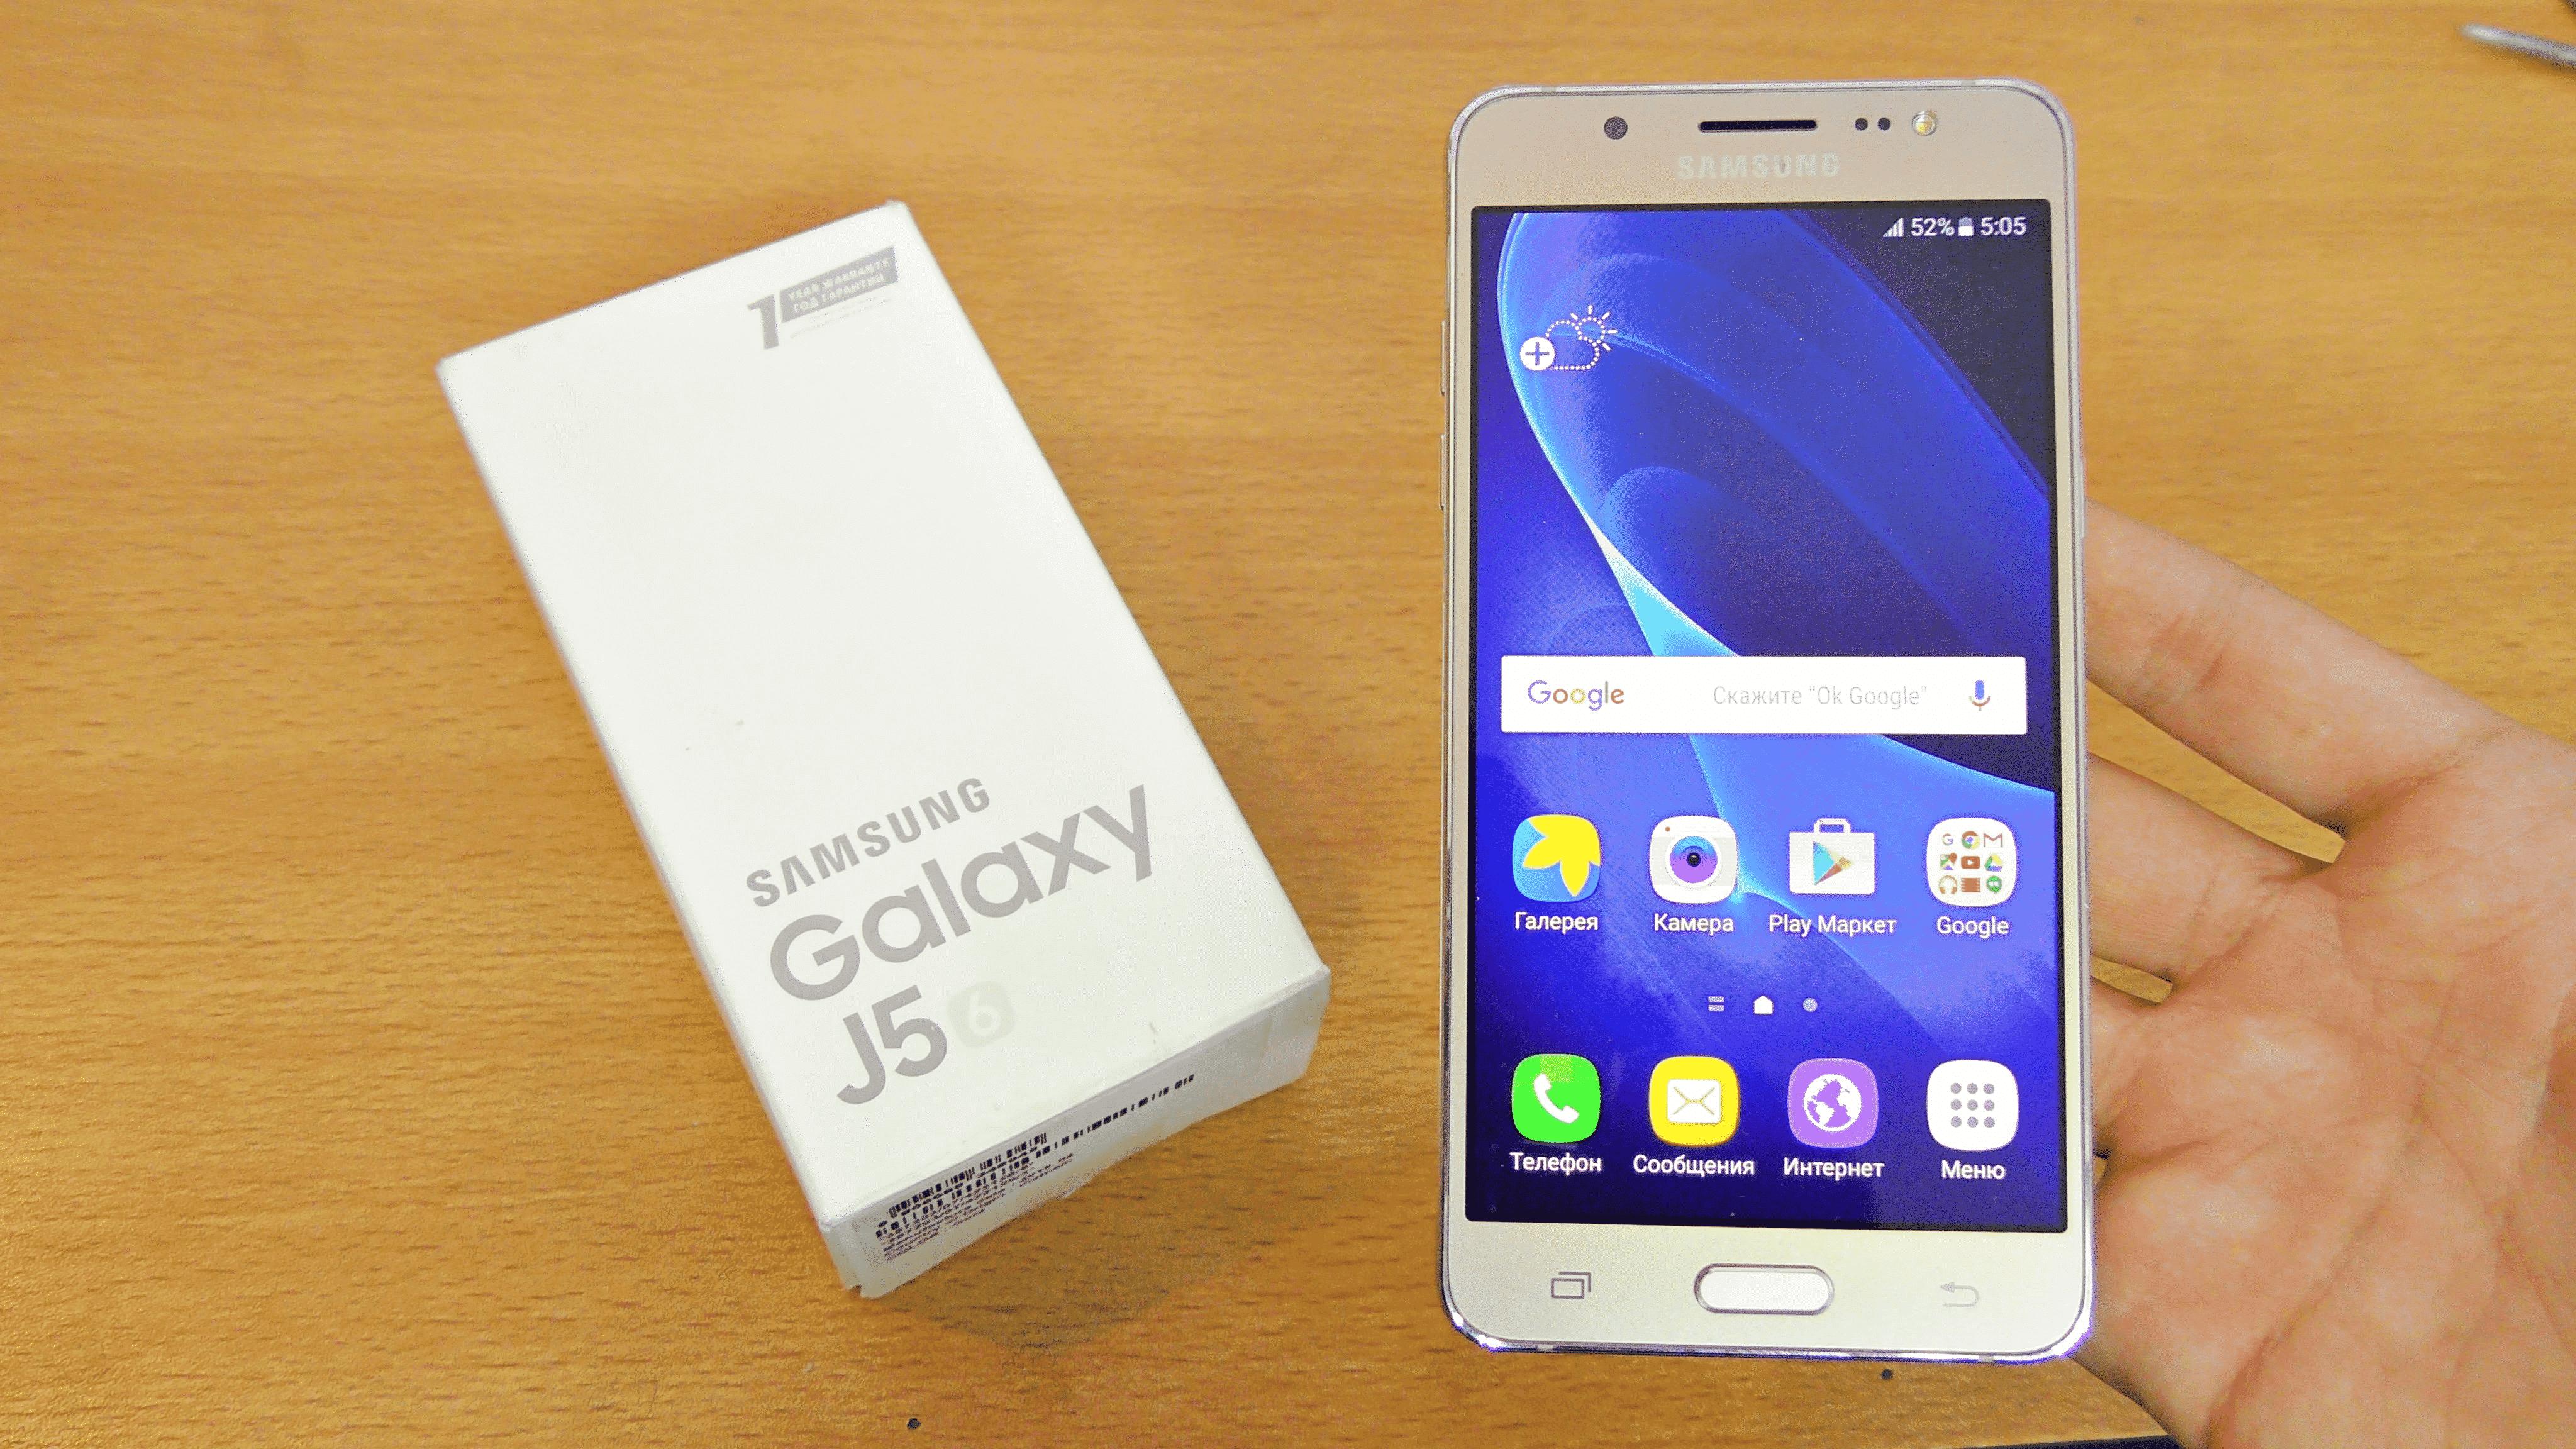 Install Android 7.1.2 Nougat on Galaxy J5 (SM-J500F) Via Lineage OS 14.1 Custom ROM 1